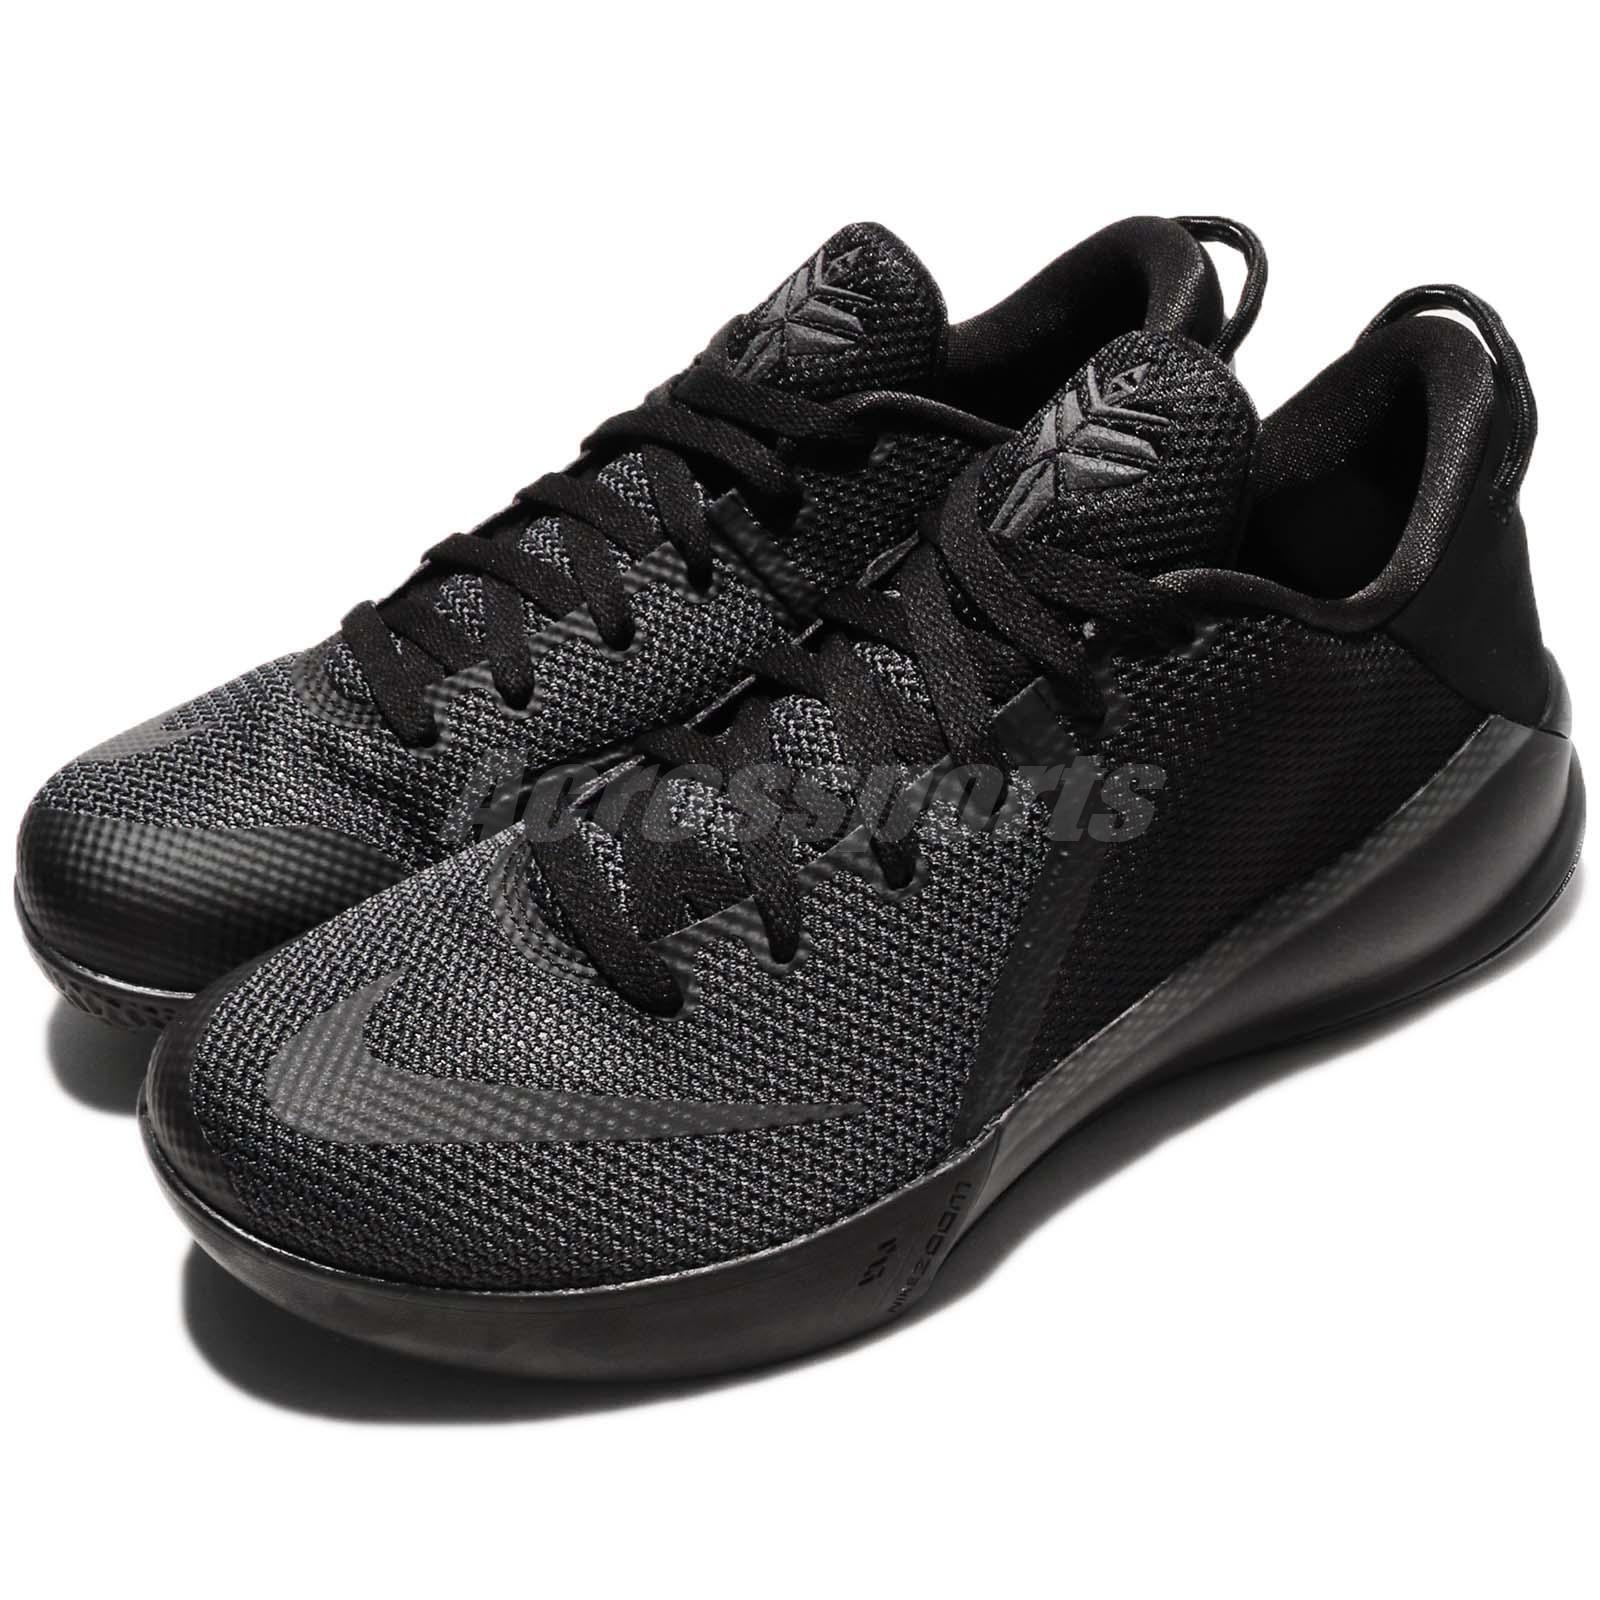 6d8ddebe96f1 Nike Zoom Kobe Venomenon 6 VI EP Bryant Triple Black Men Basketball  897657-001